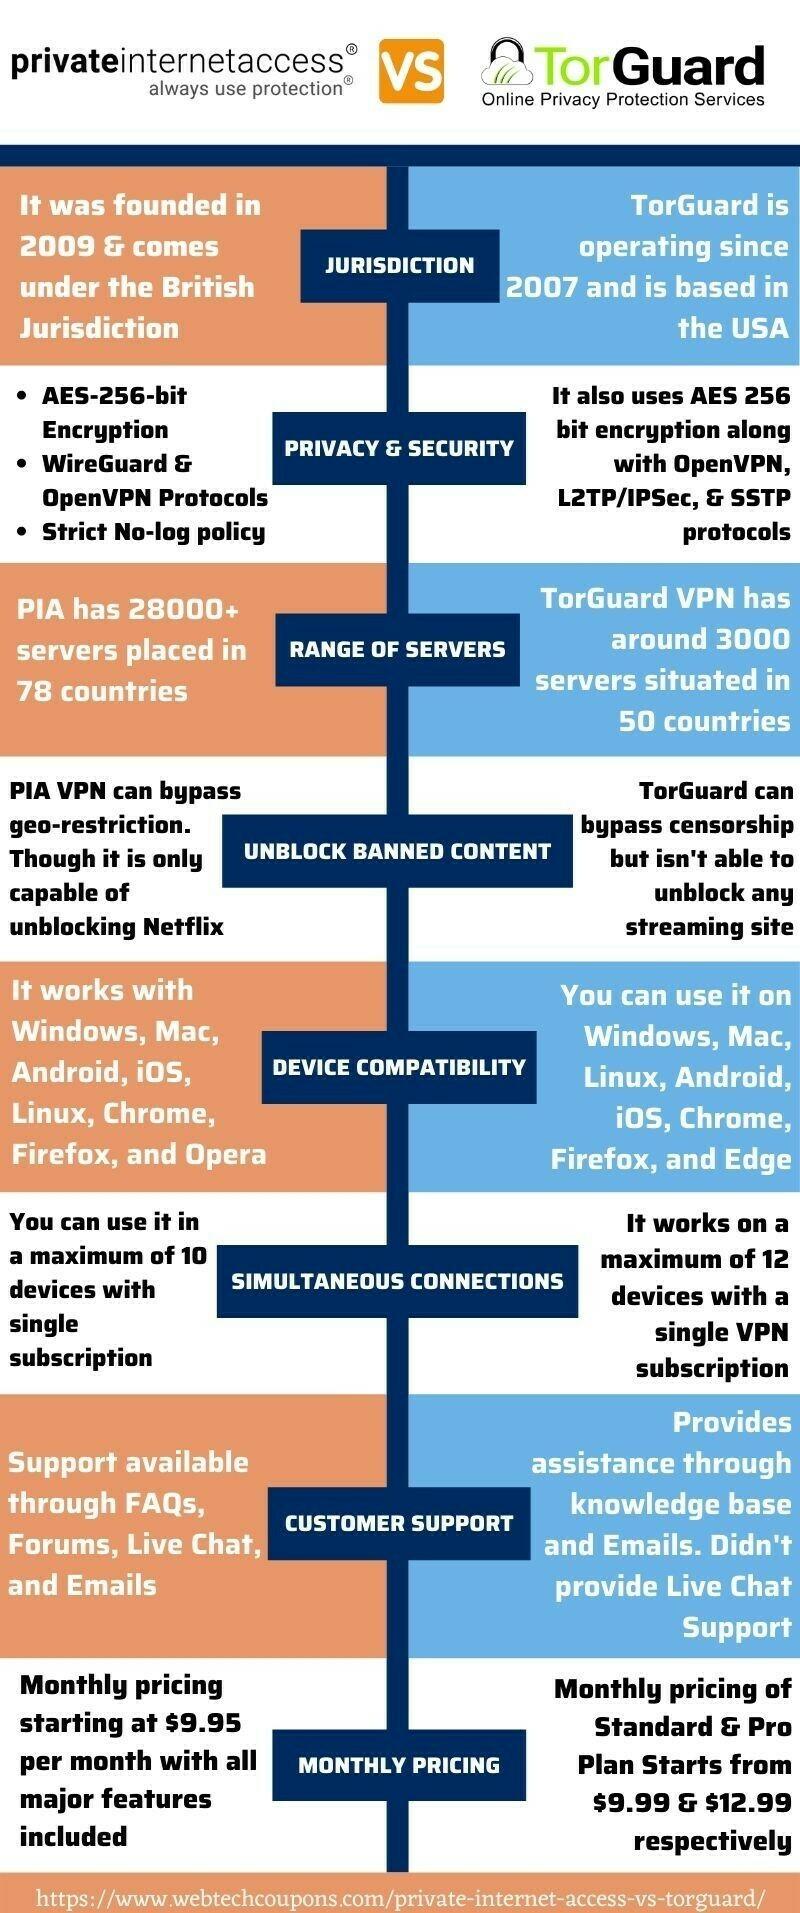 TorGuard Vs Private internet access www.webtechcoupons.com